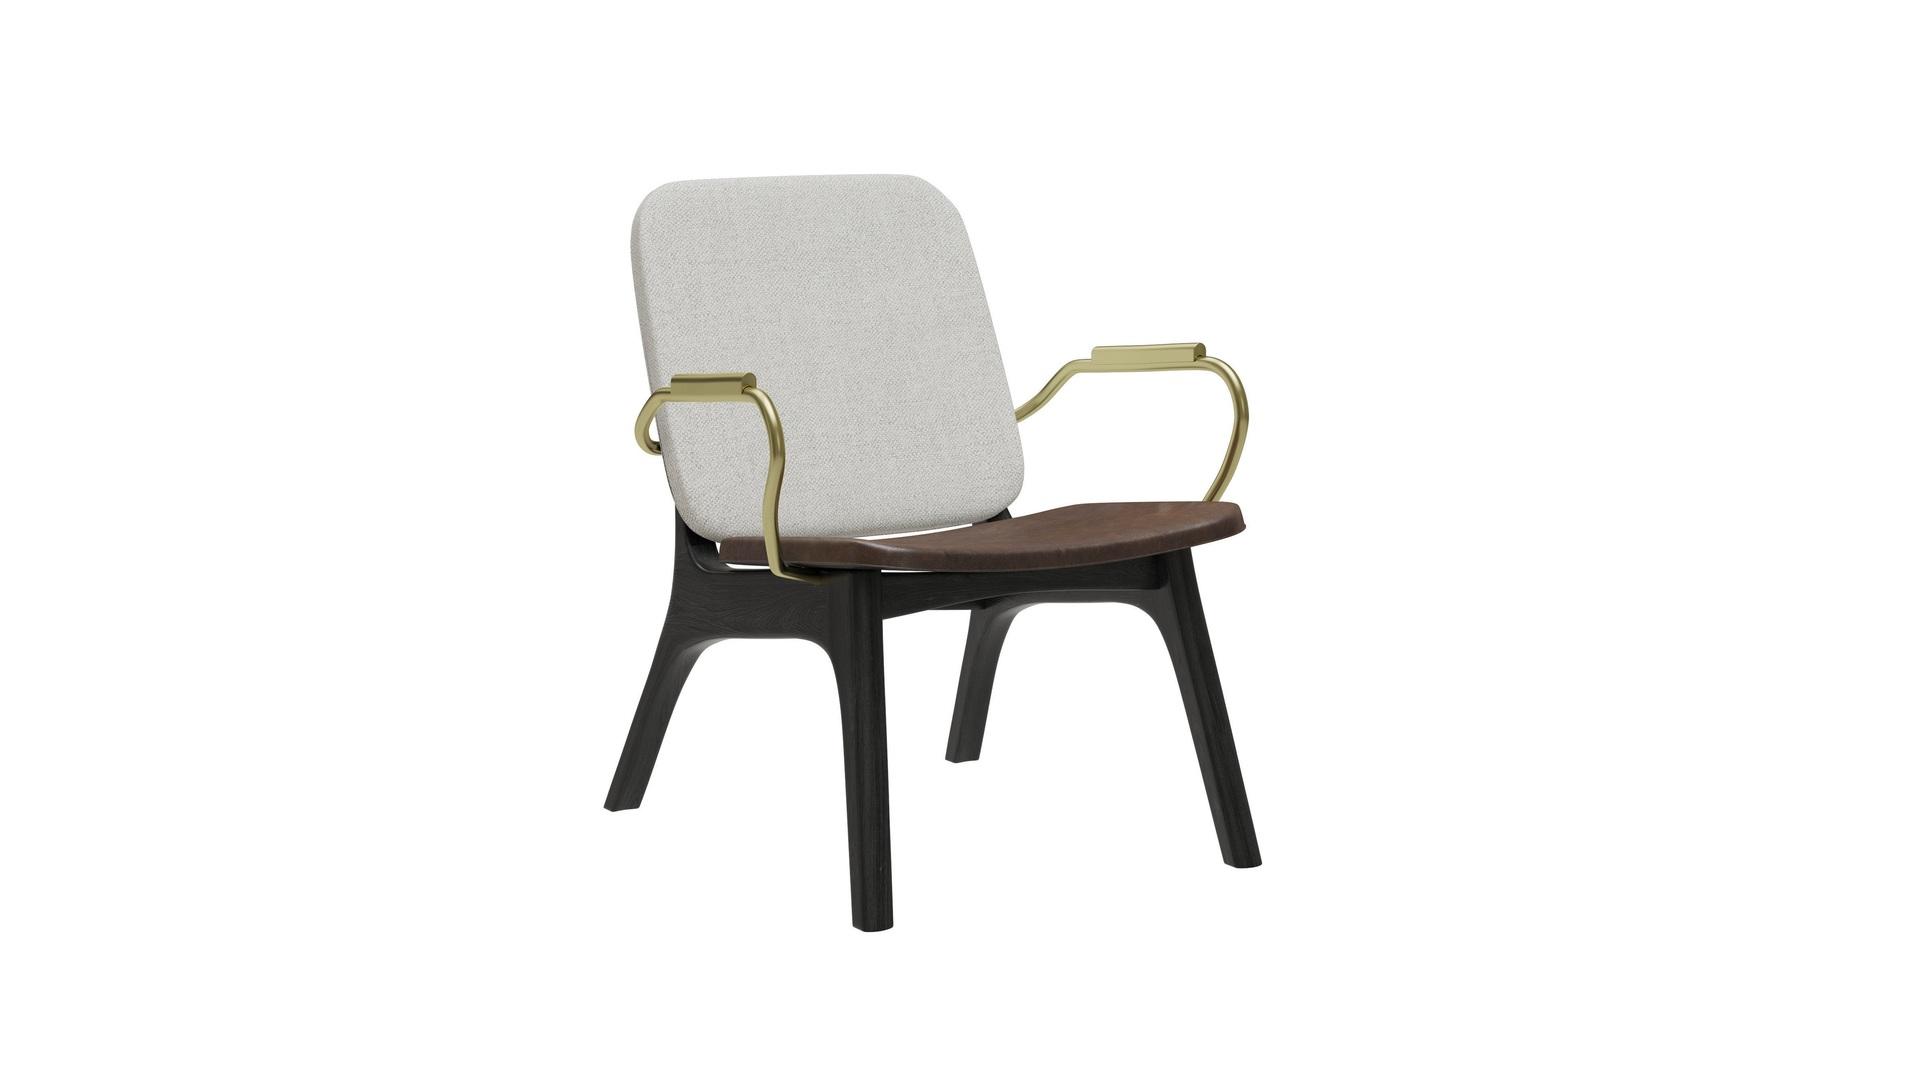 Baxter Thea armchair2.jpg